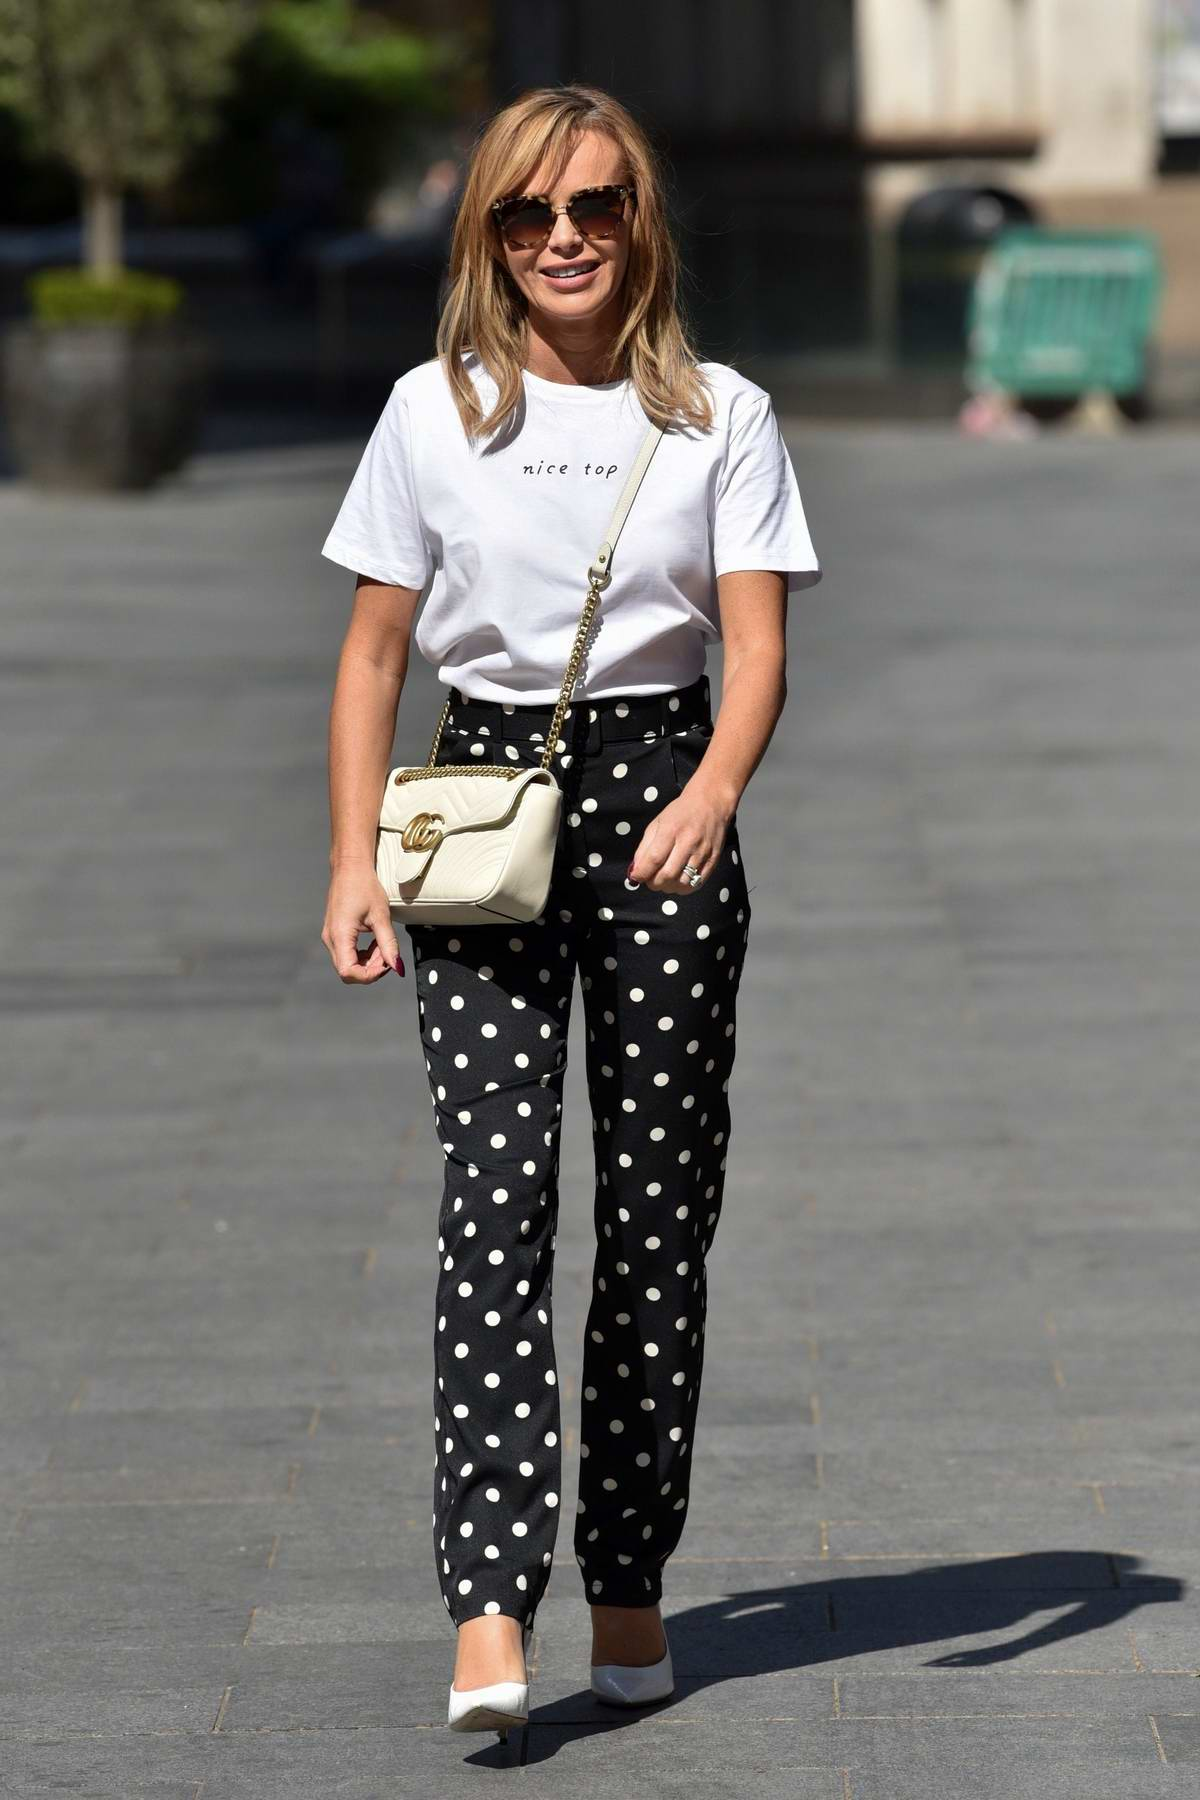 Amanda Holden dons polka dot pants as she leaves Global Radio Studios in London, UK